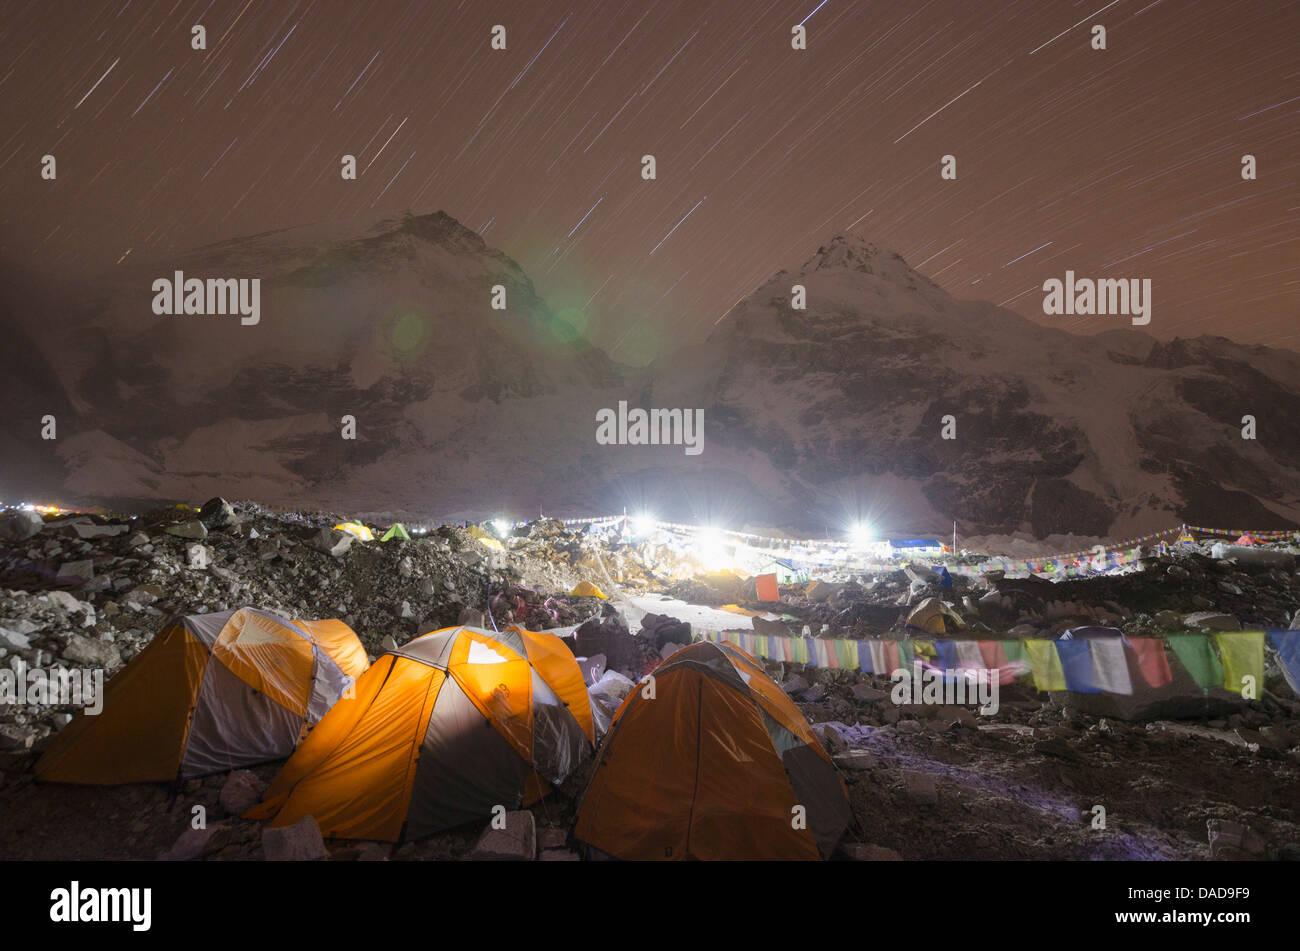 Tents at Everest Base Camp at night, Solu Khumbu Everest Region, Sagarmatha National Park, UNESCO Site, Nepal - Stock Image